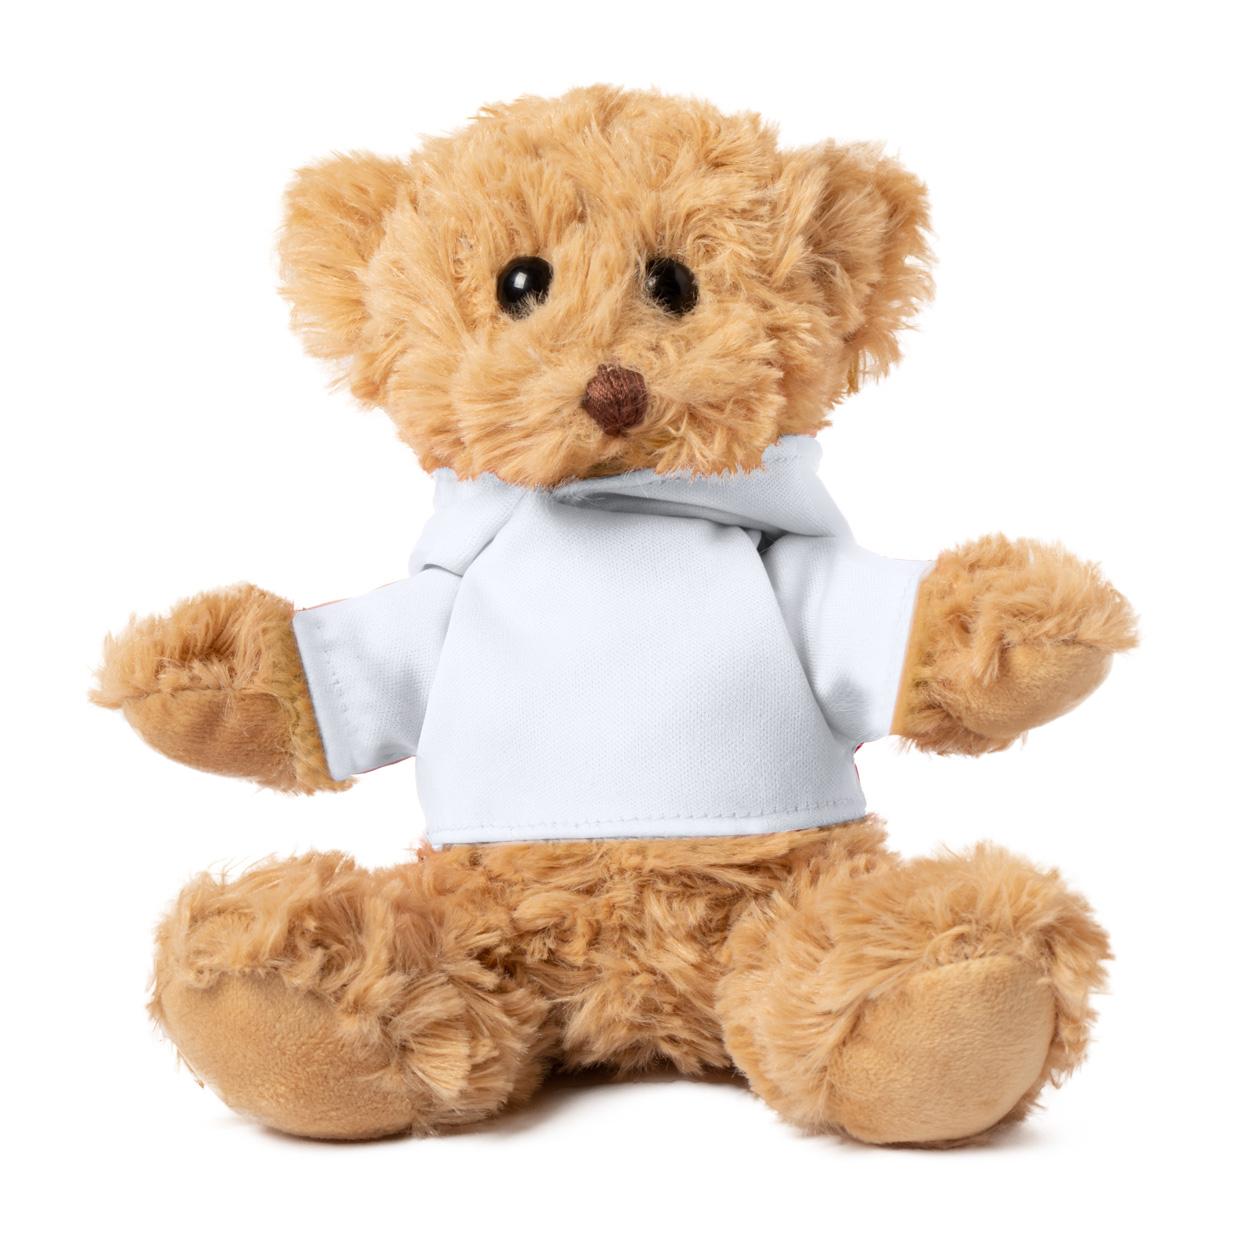 Loony teddy bear